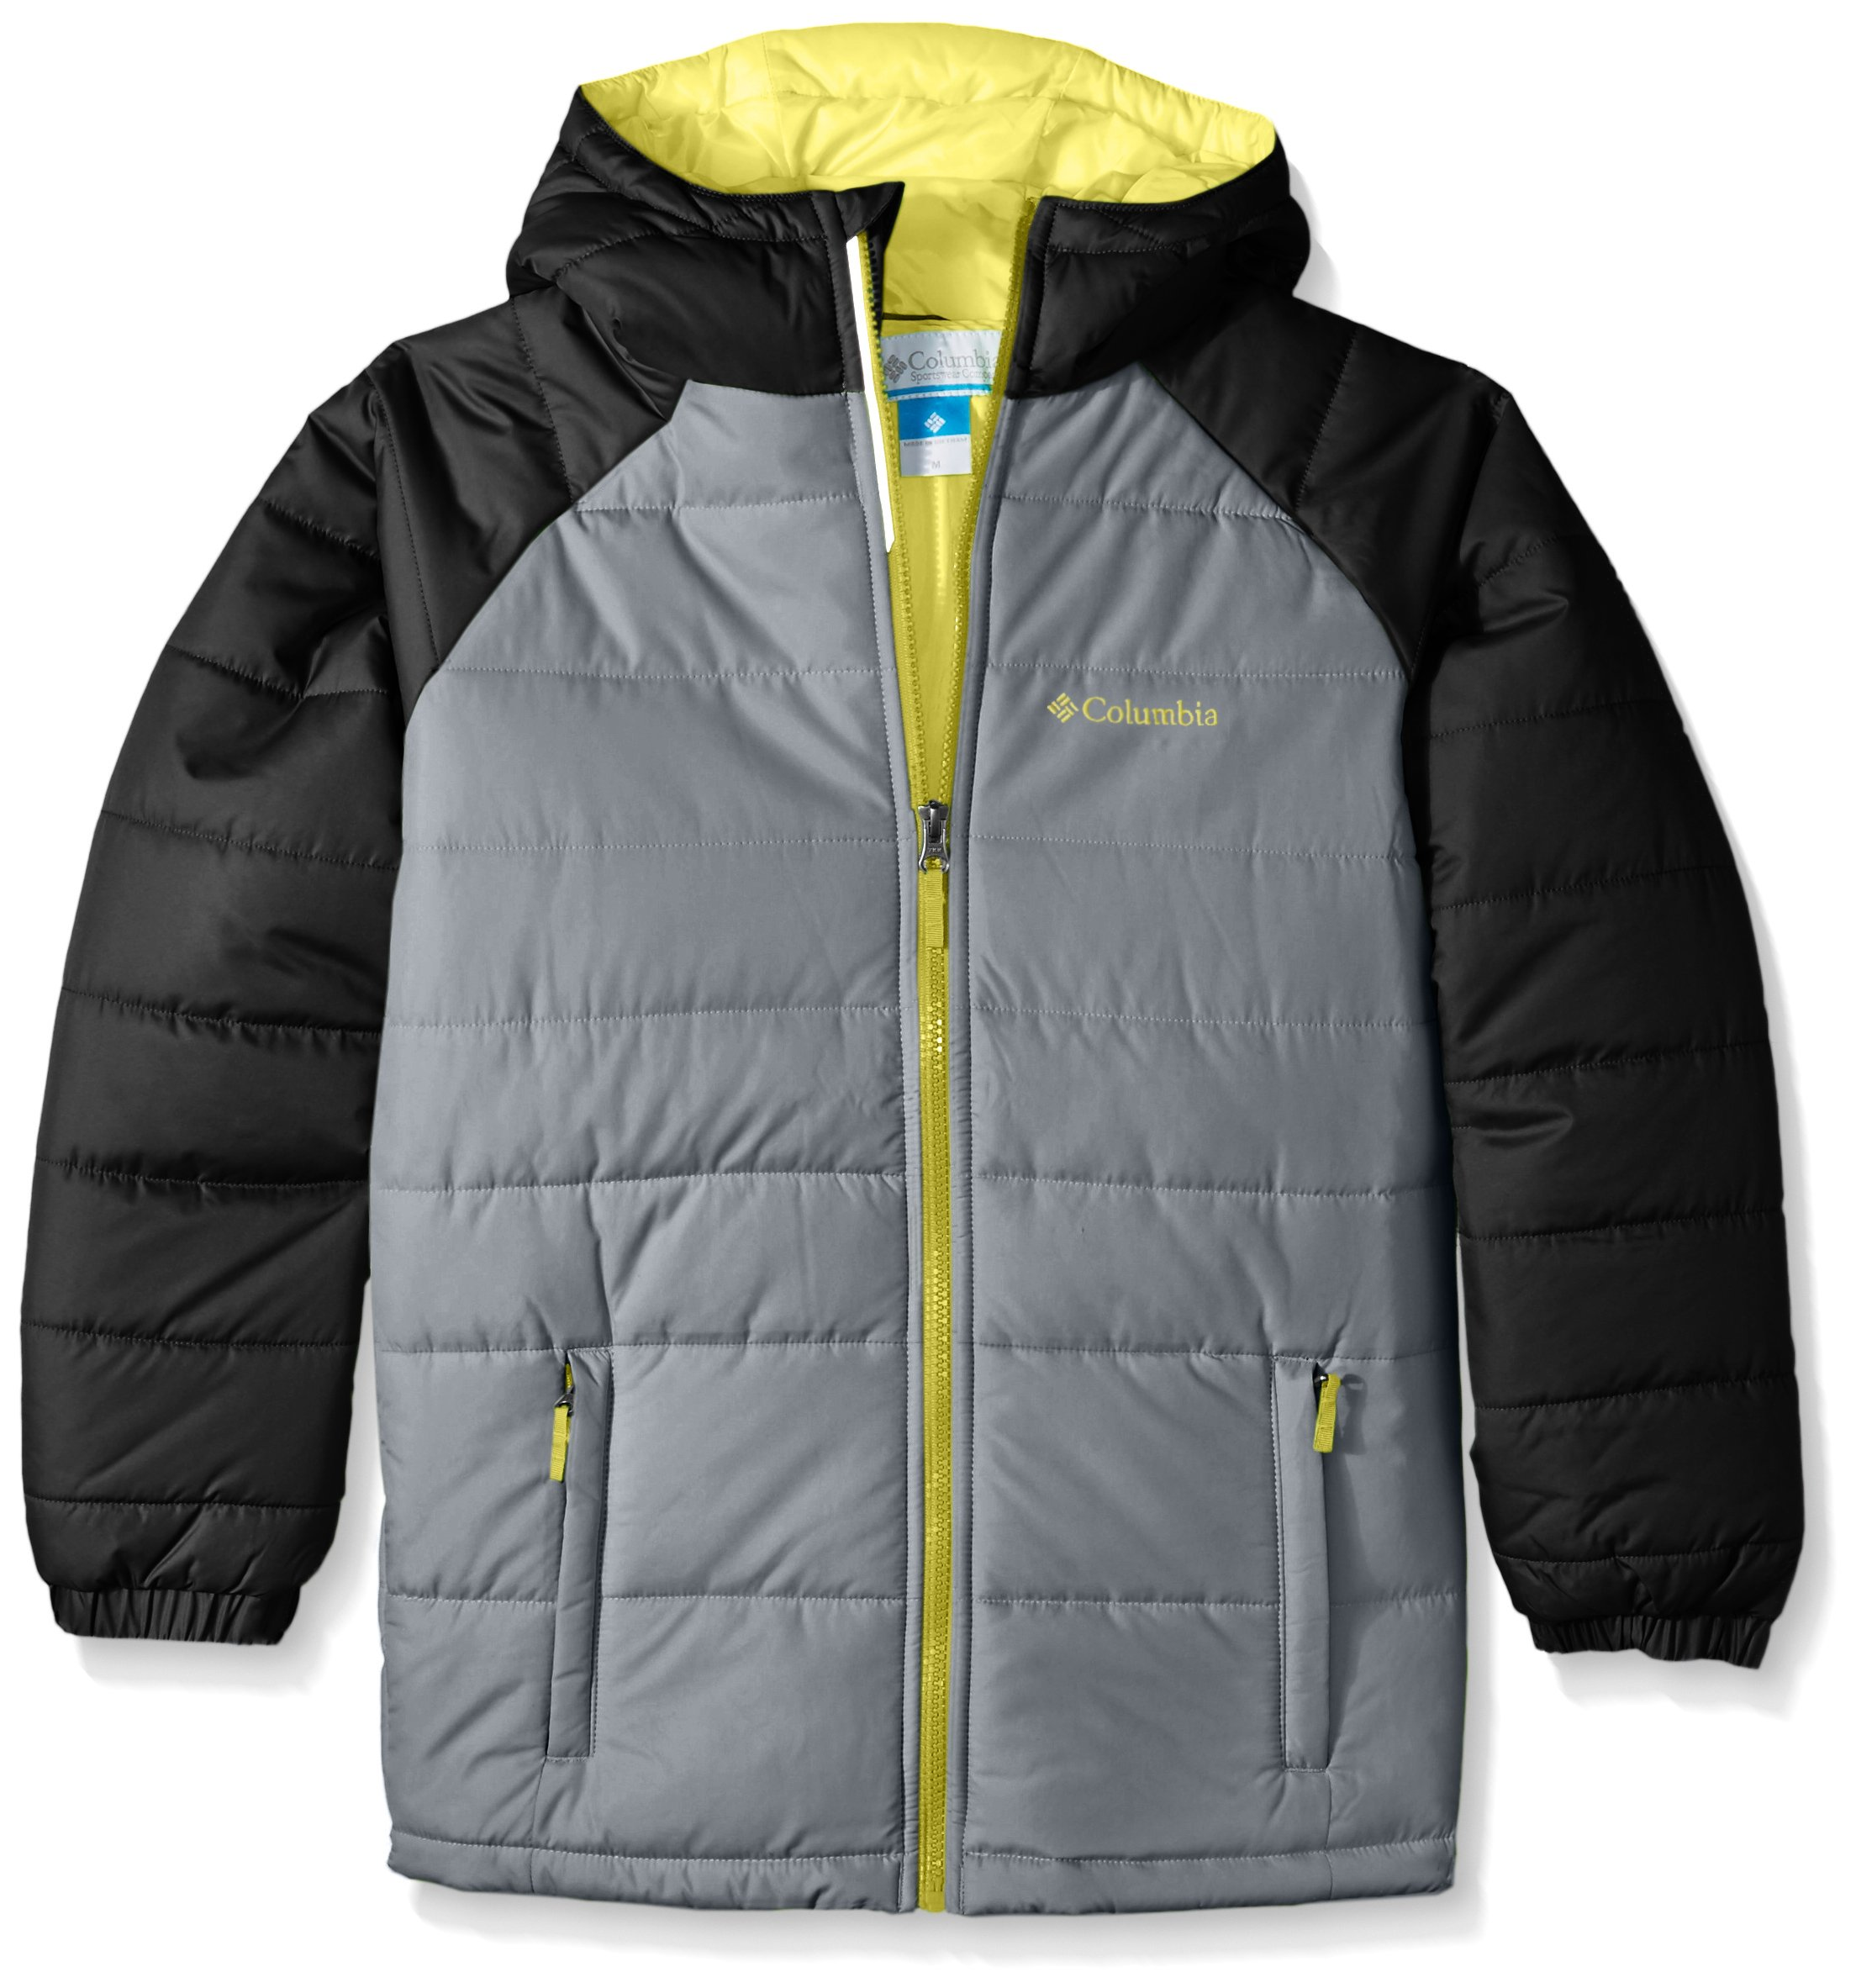 Columbia Boys' Big Tree Time Puffer Jacket, Grey Ash, Medium